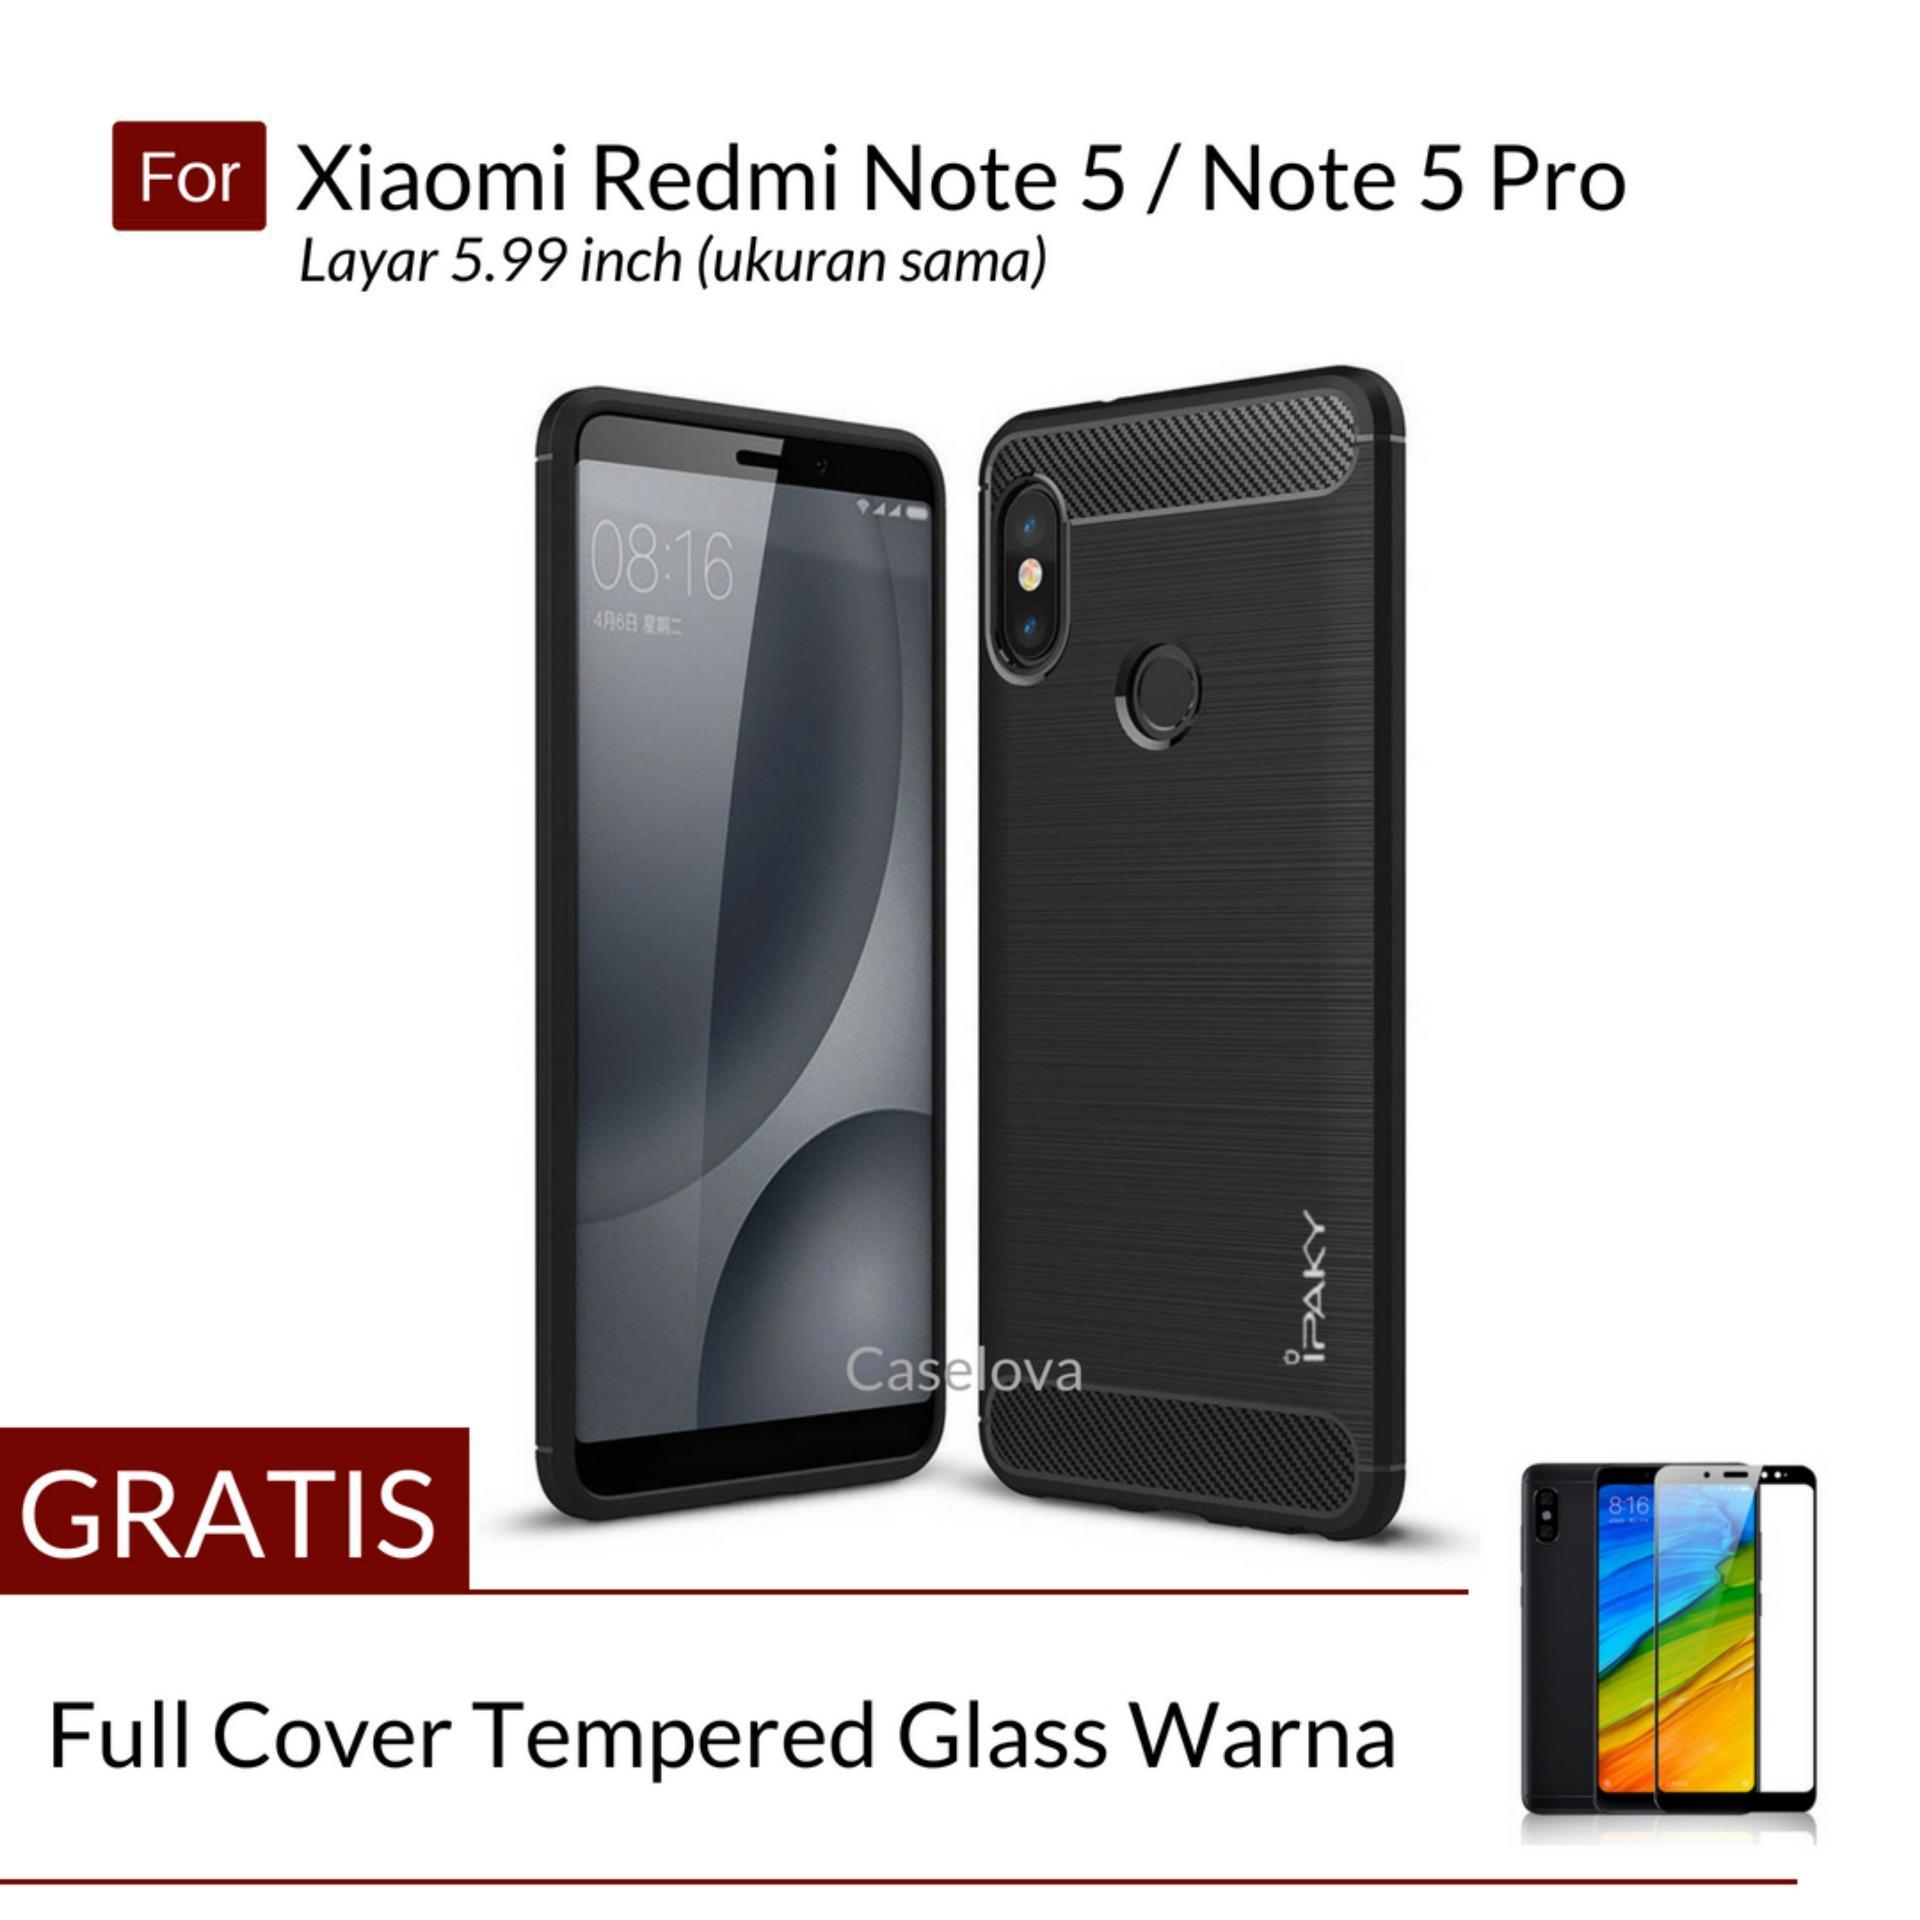 Caselova Premium Quality Carbon Shockproof Hybrid Case for Xiaomi Redmi Note 5, Redmi Note 5 Pro Layar 5.99 inch ( ukuran sama ) - Black + Gratis Full Cover Tempered Glass Warna